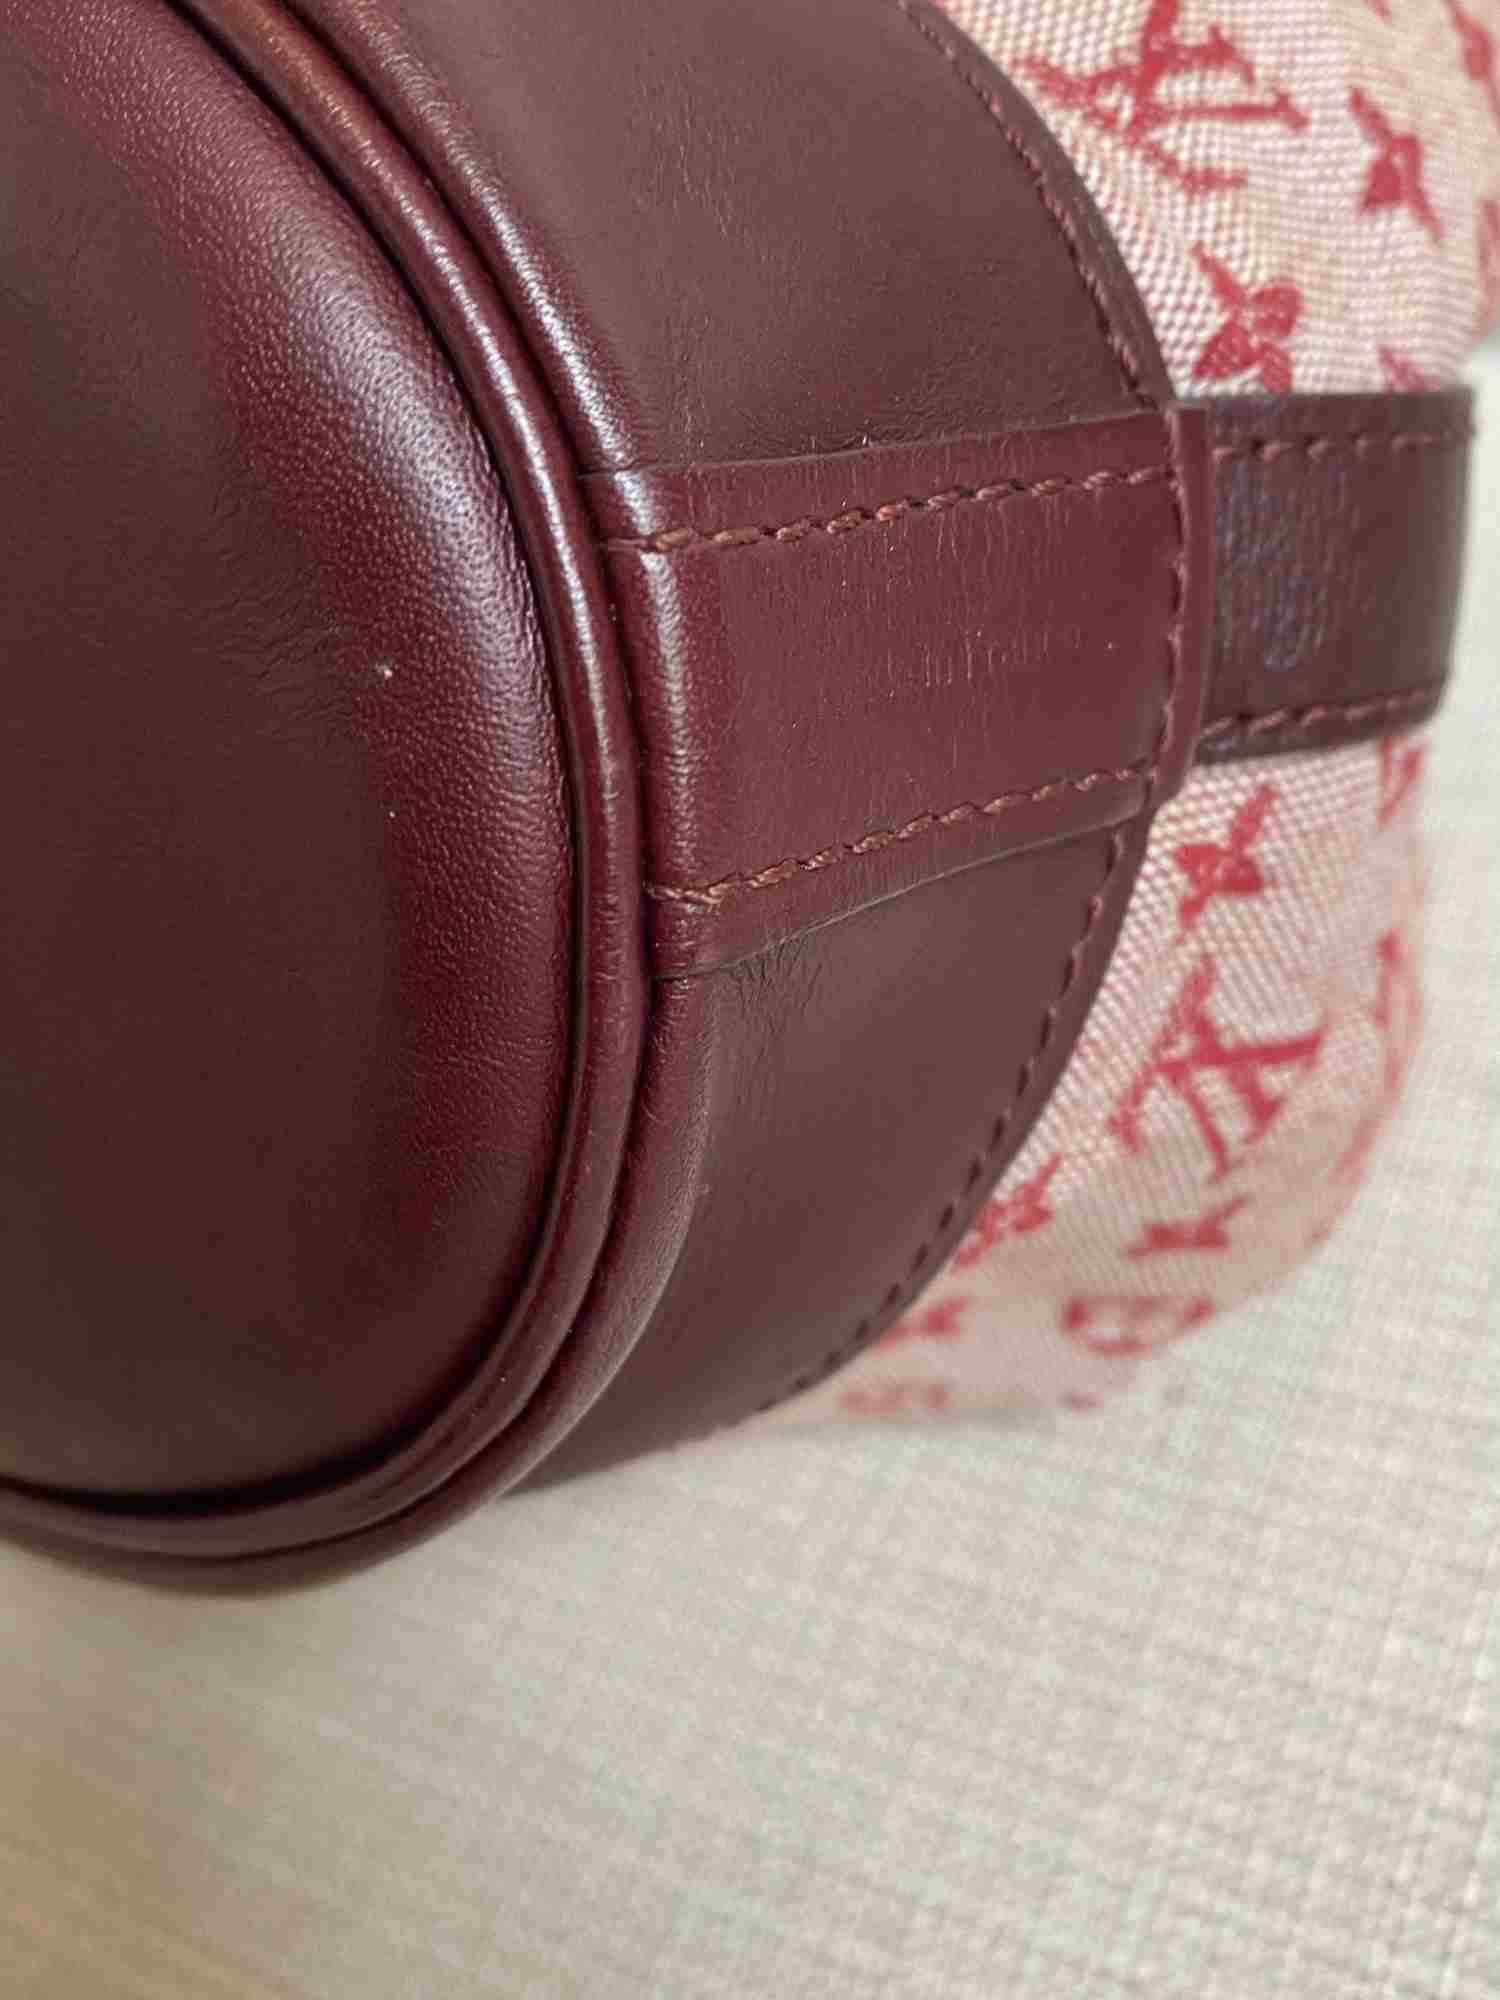 Bolsa Louis Vuitton Noelie Idylle Sepia Mini